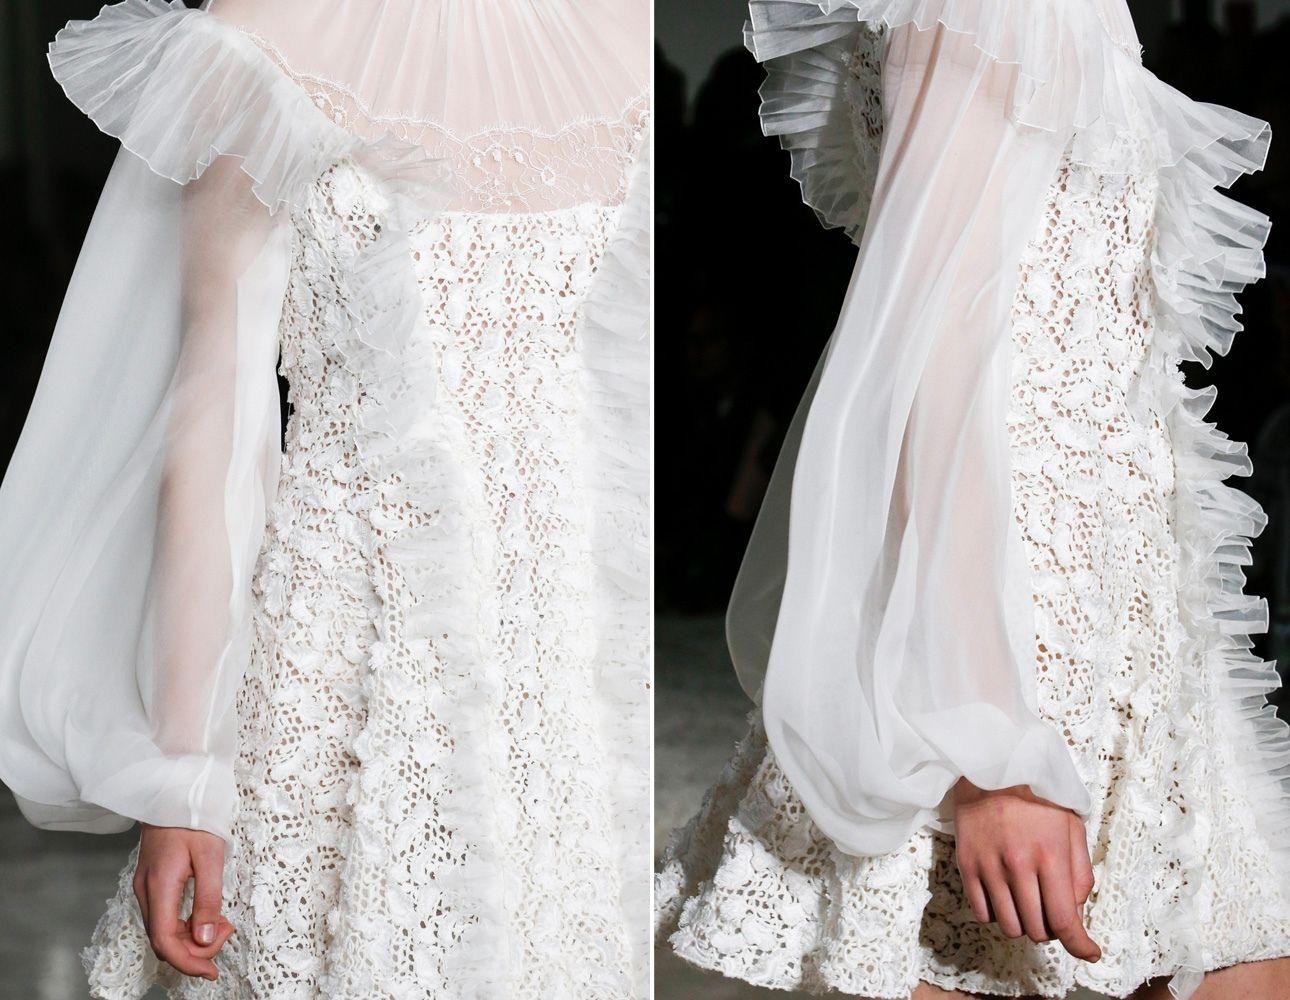 #мода #модныедетали #весна2019 #ss2019 #fashiondetails # ...